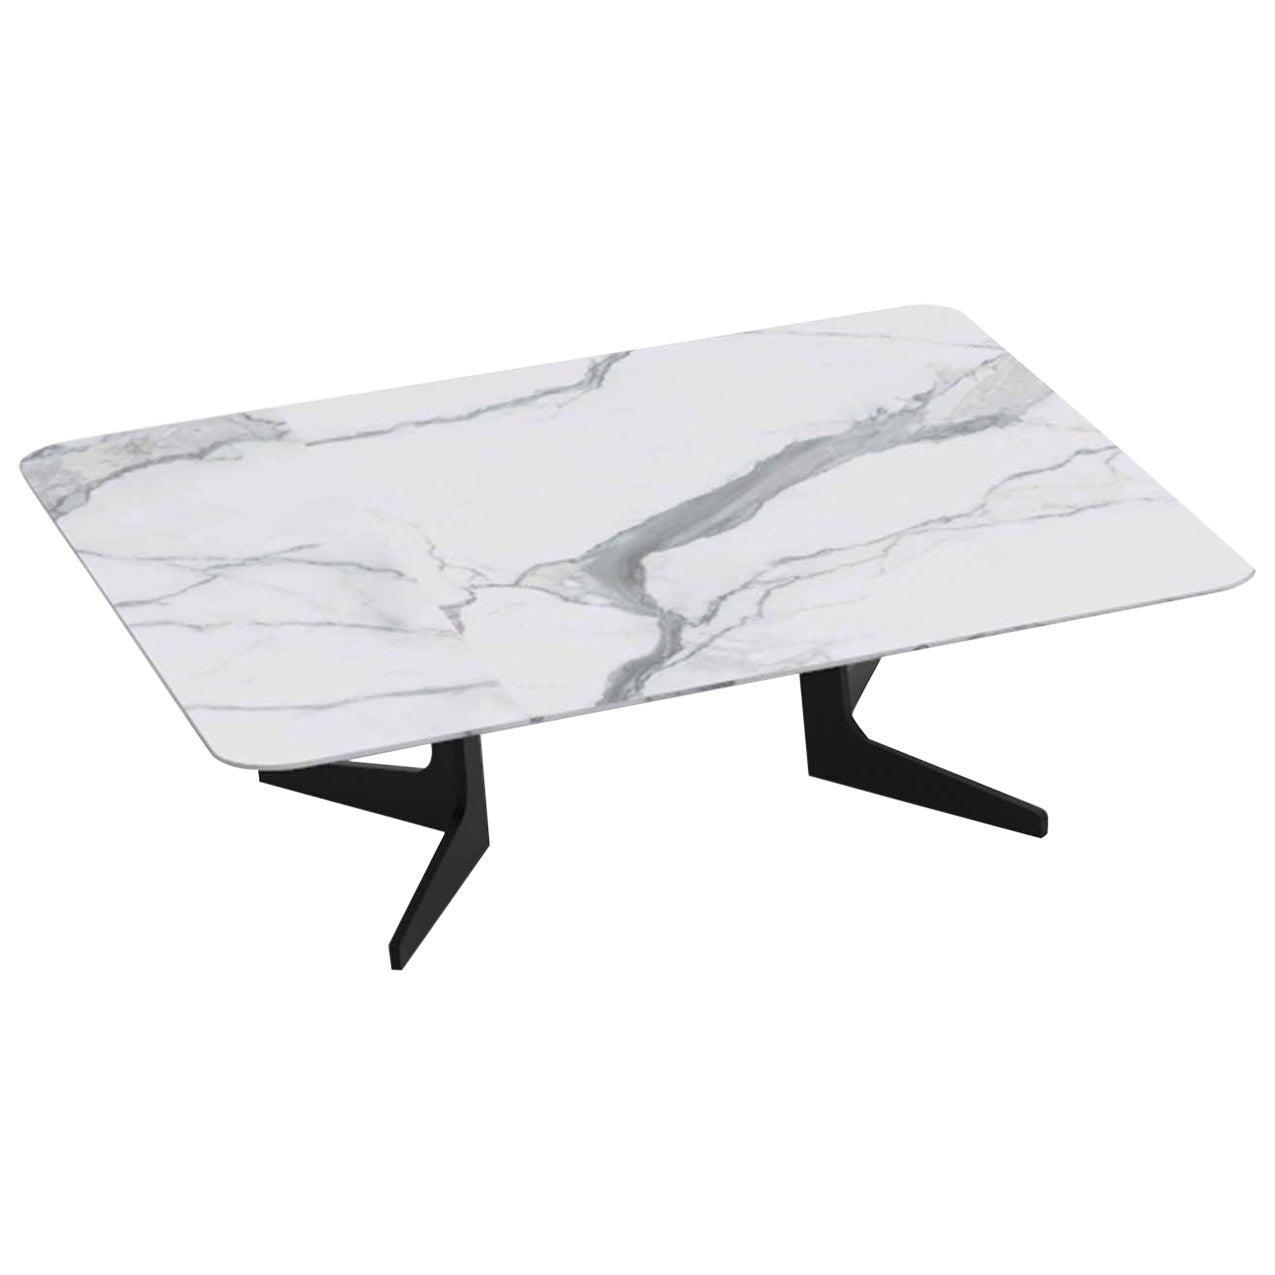 Blake Rectangular Coffee Table with Calacatta Marble Top